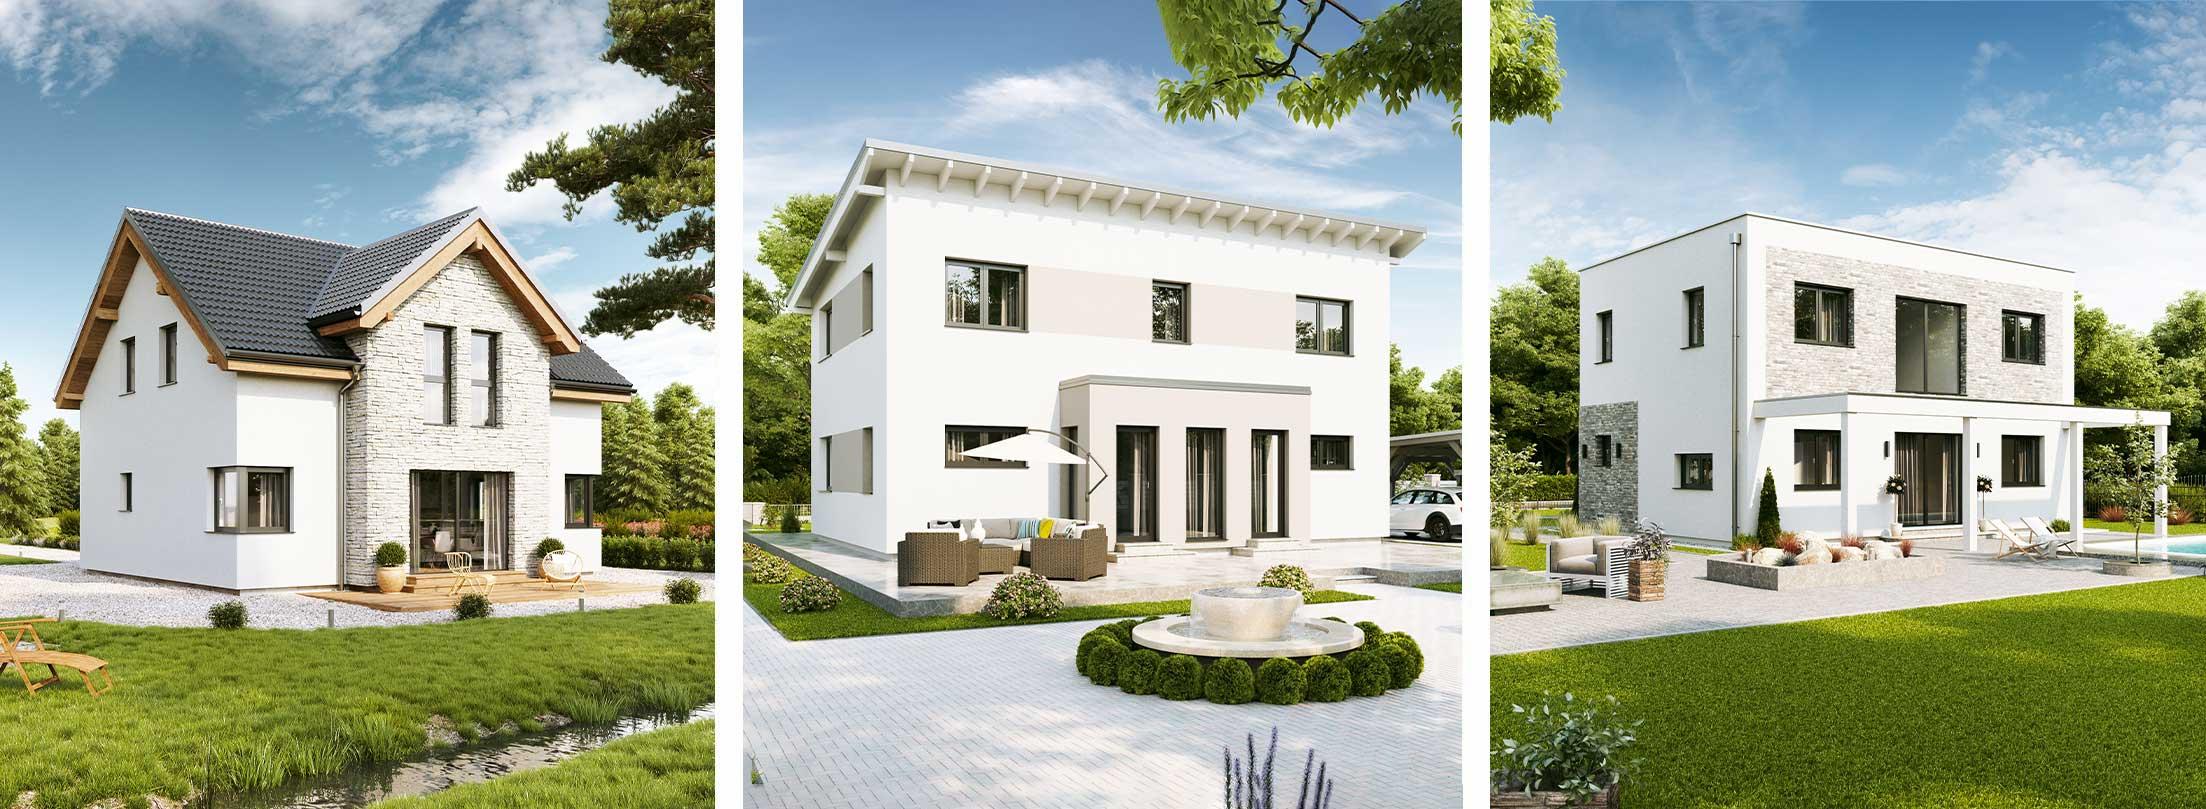 fertighaus fertigteilhaus vario haus bauen. Black Bedroom Furniture Sets. Home Design Ideas